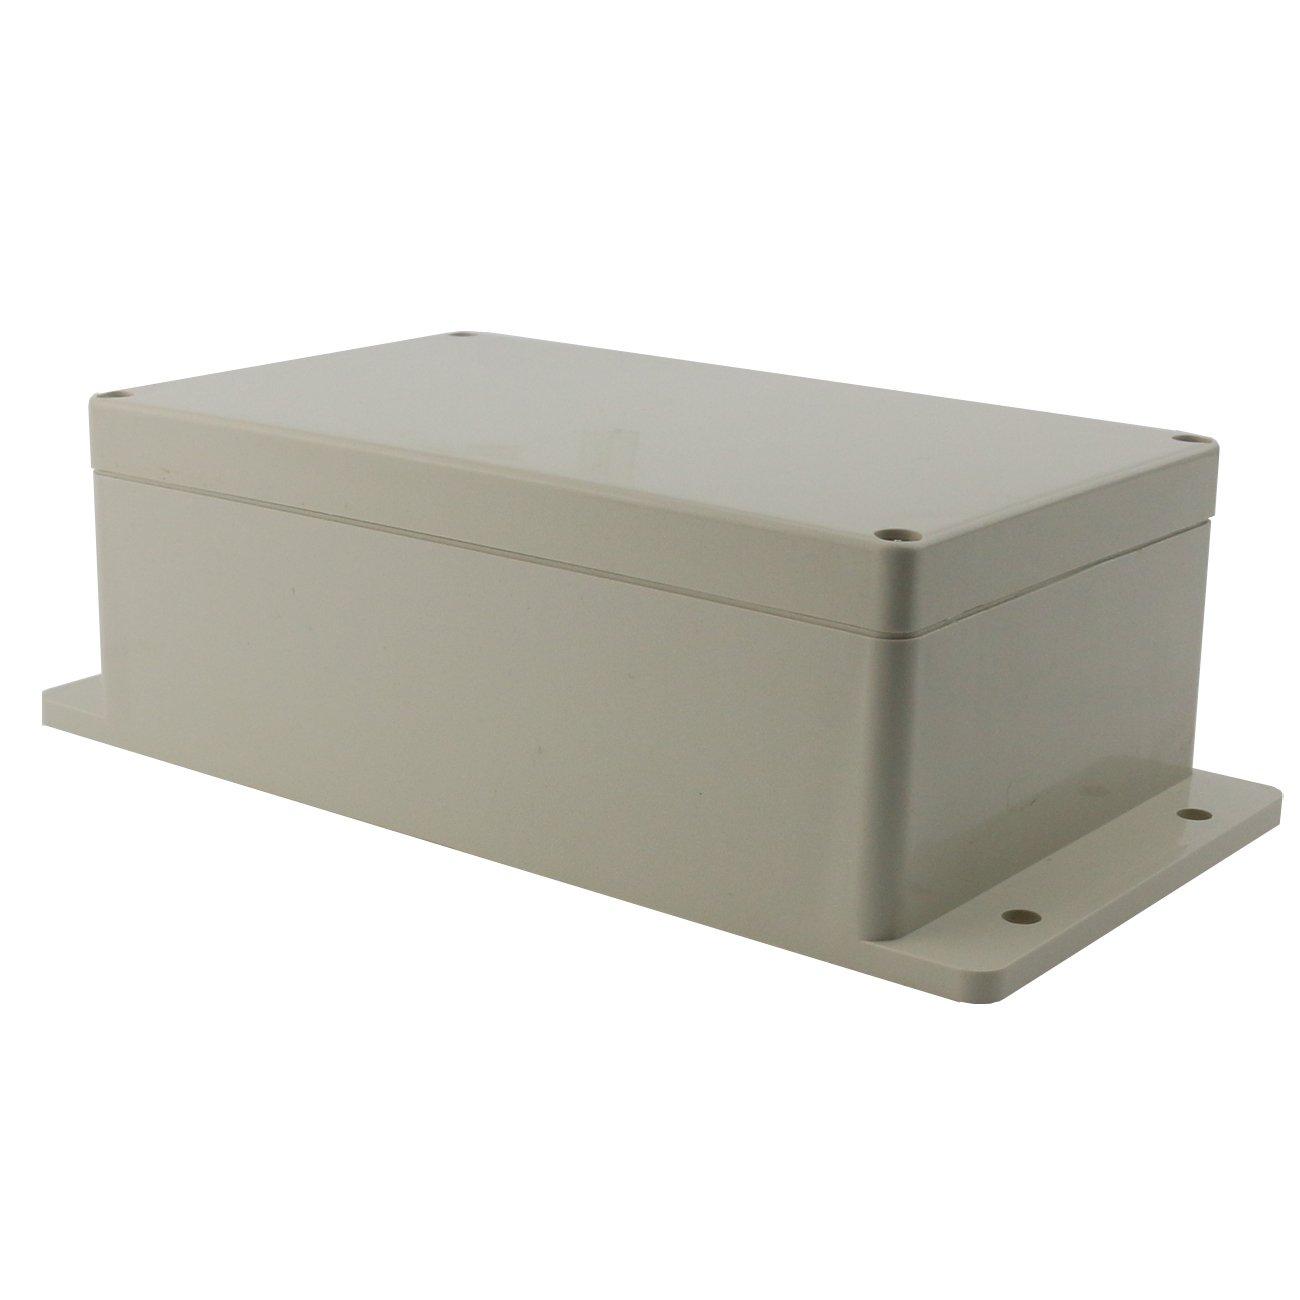 Ogrmar Plastic Dustproof IP65 Junction Box DIY Case Enclosure 7.8x 4.7x 3